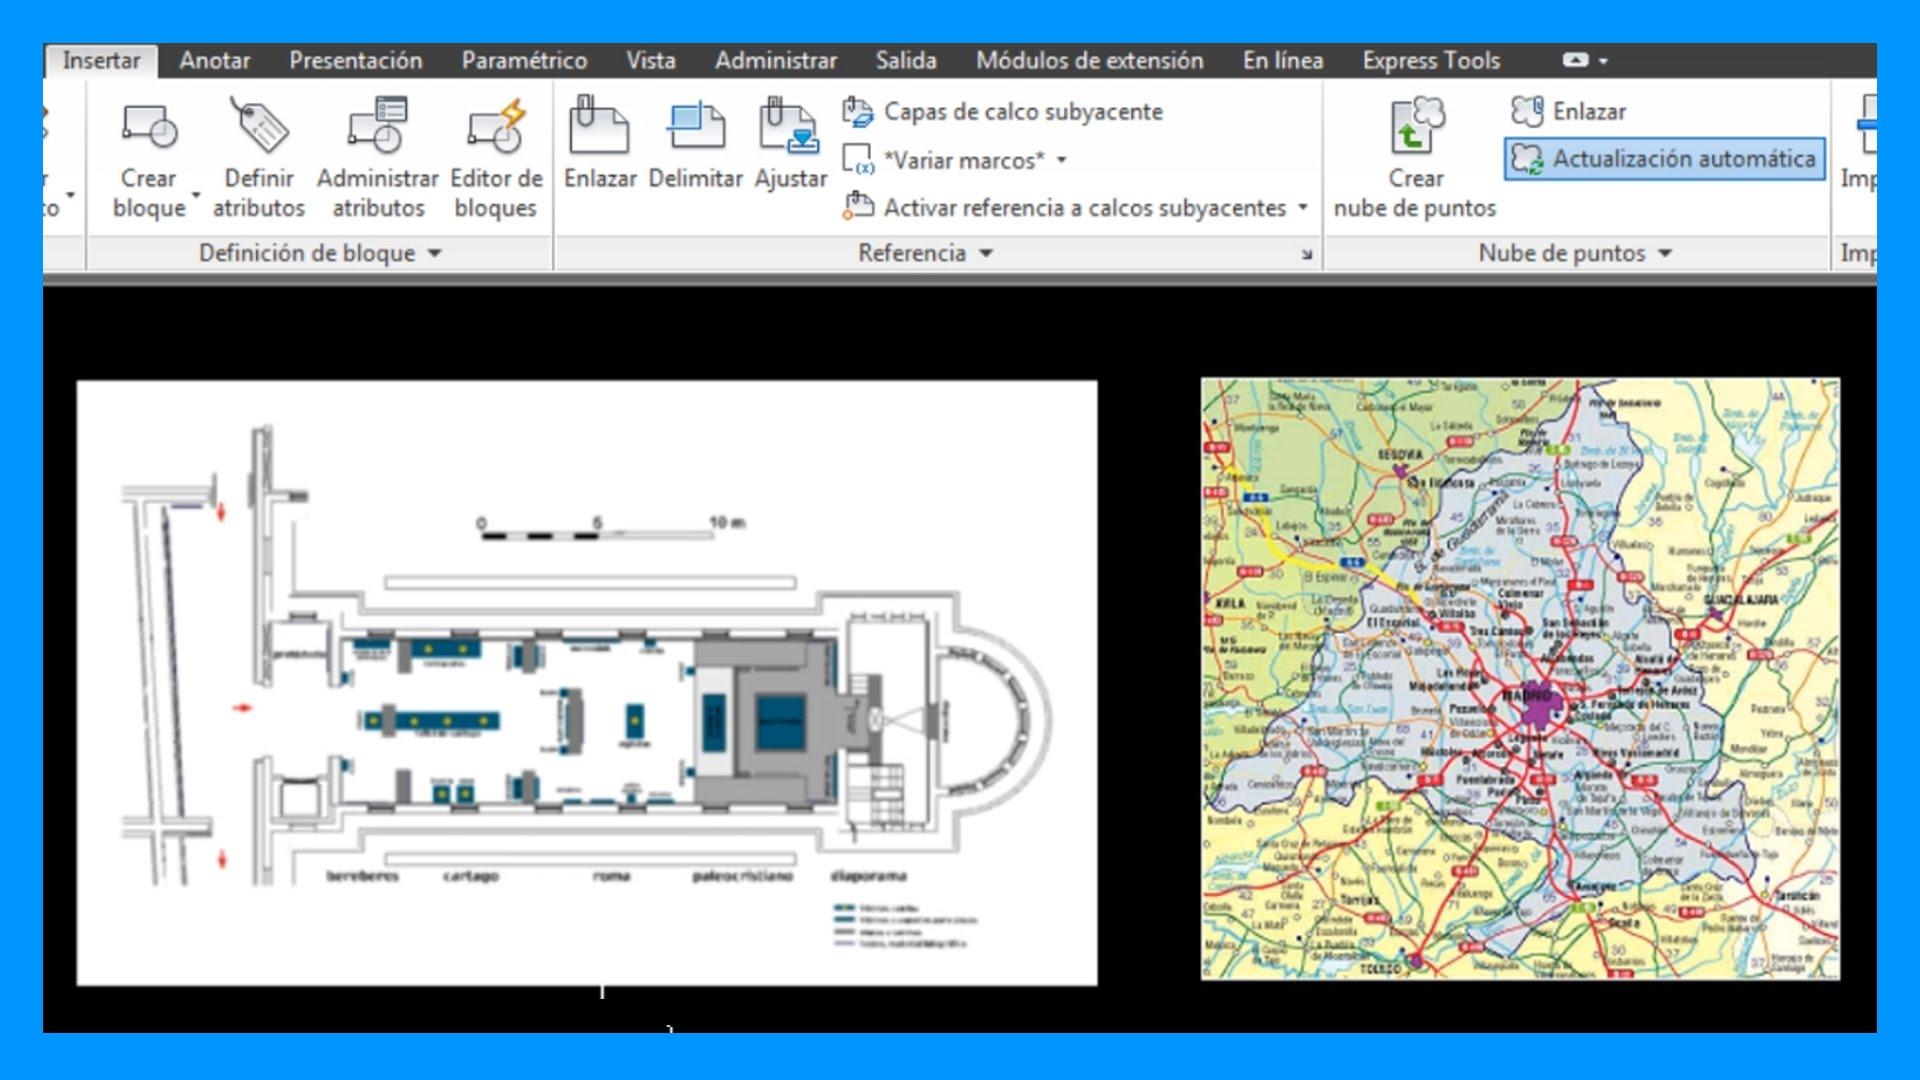 Autocad – Insertar imagen en Autocad. Insertar foto en Autocad.